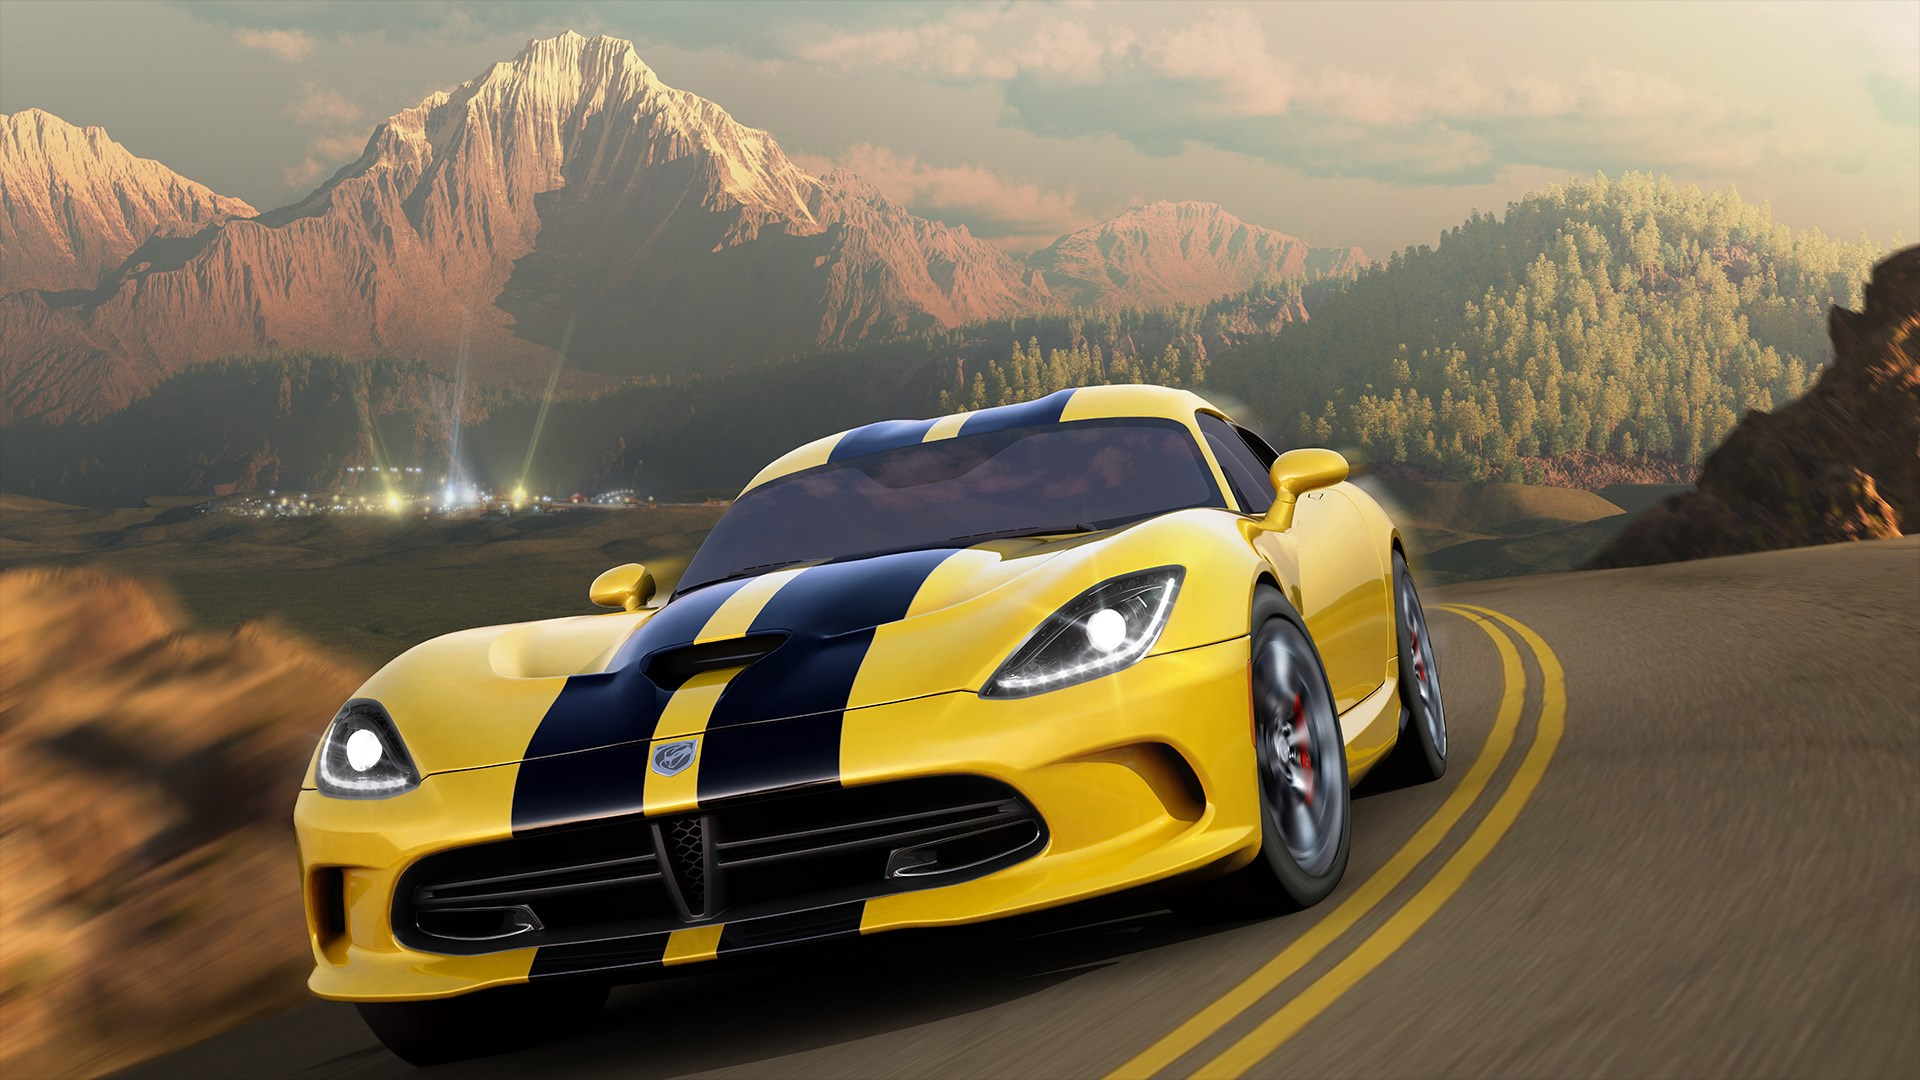 2013 Ford Shelby GT500 - Rockstar Energy